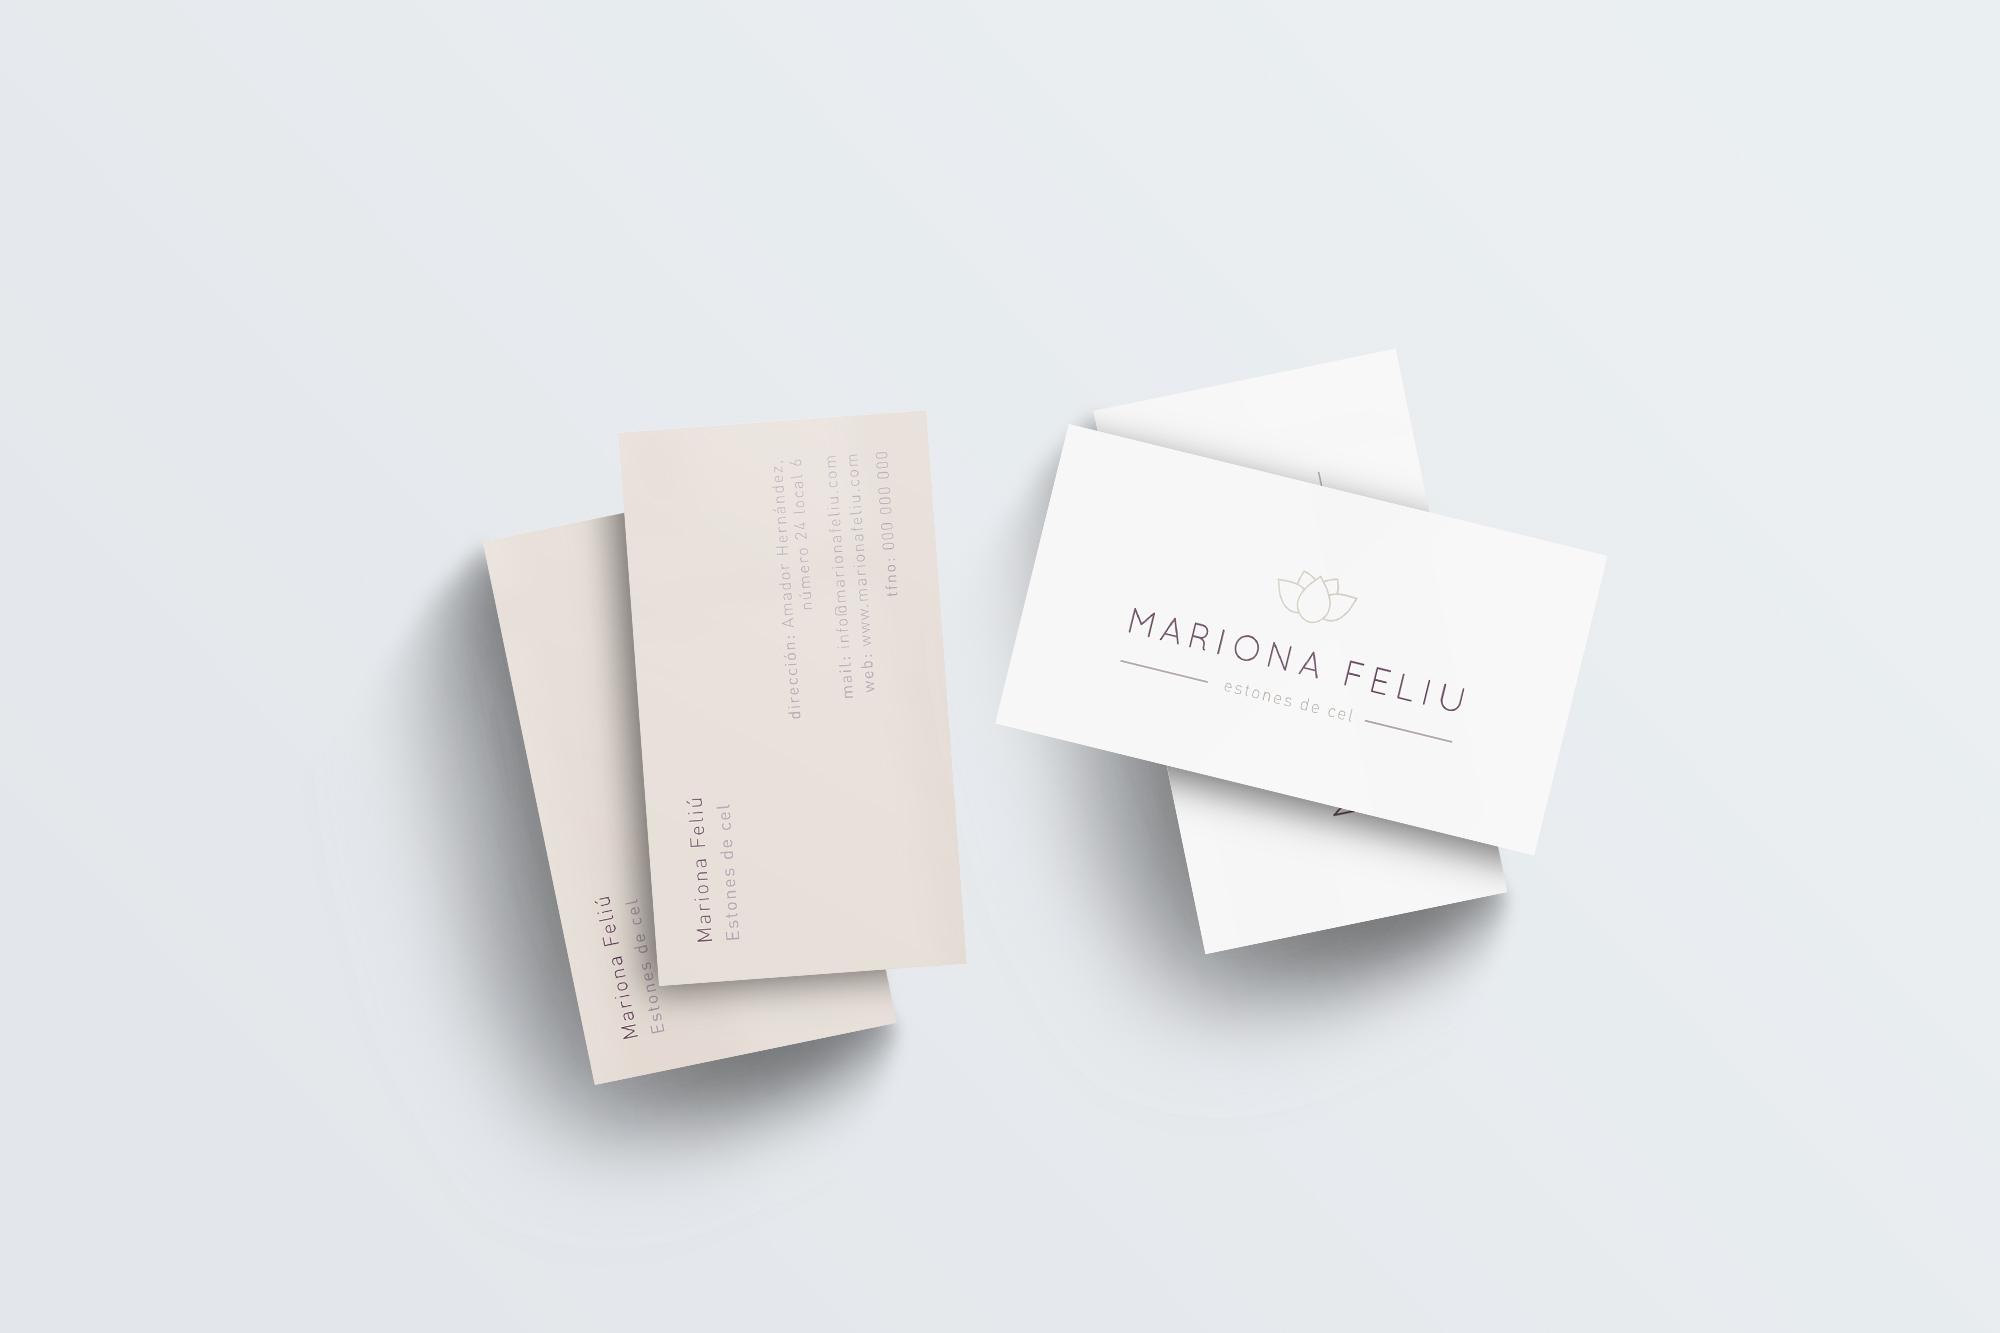 Mockup-Mariona-Feliu-tarjetas-diseño-imagen-corporativa